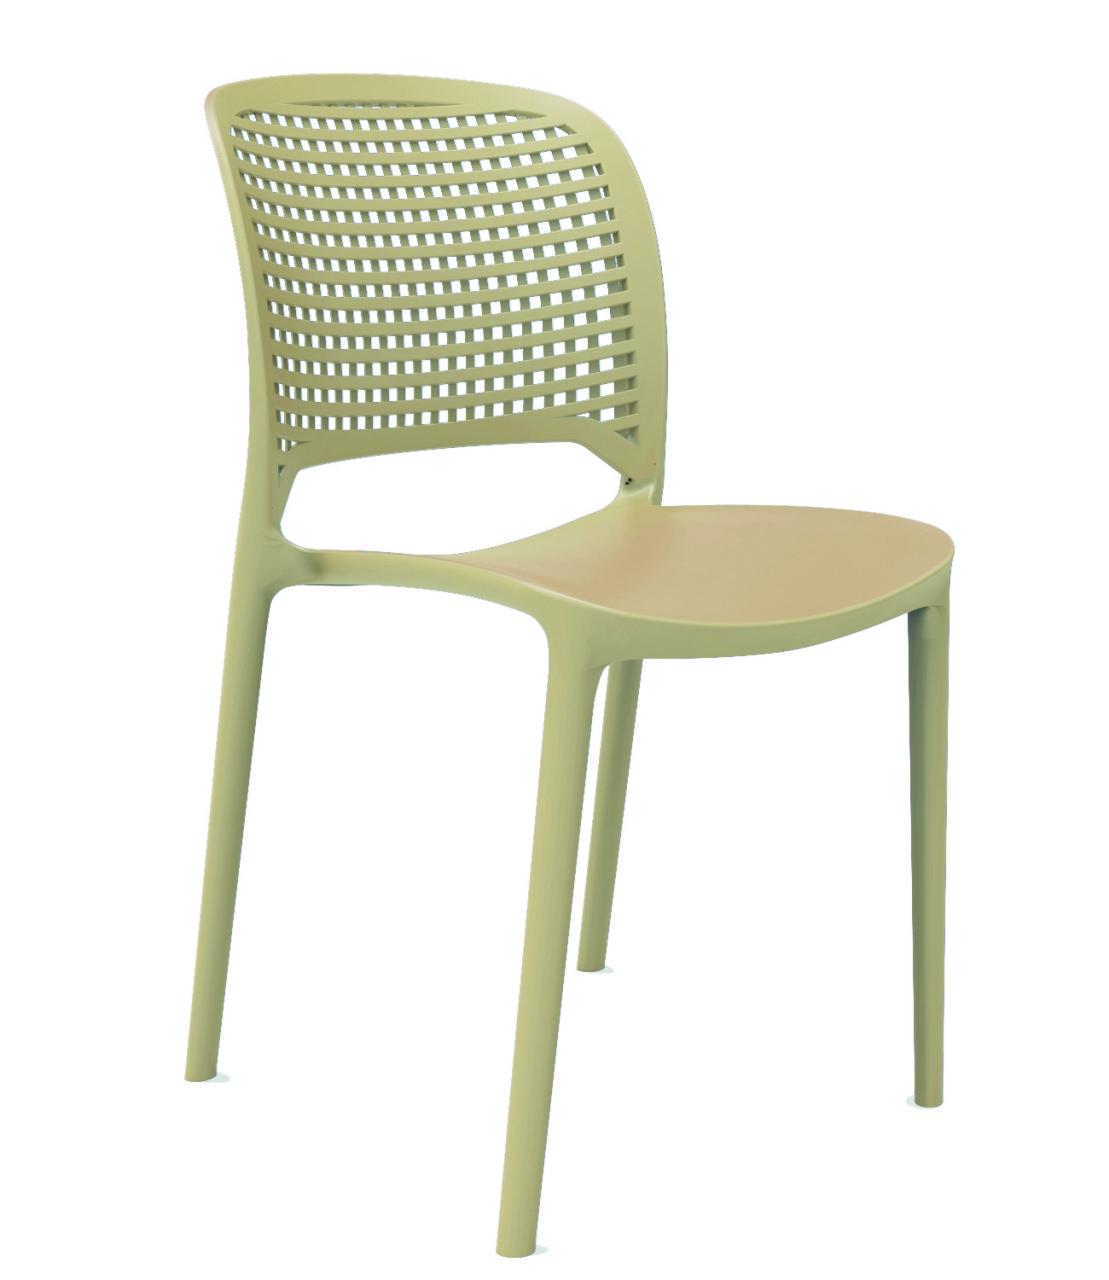 Mobilier Coulomb Chaise De Terrasse Design Alicia Mobilier